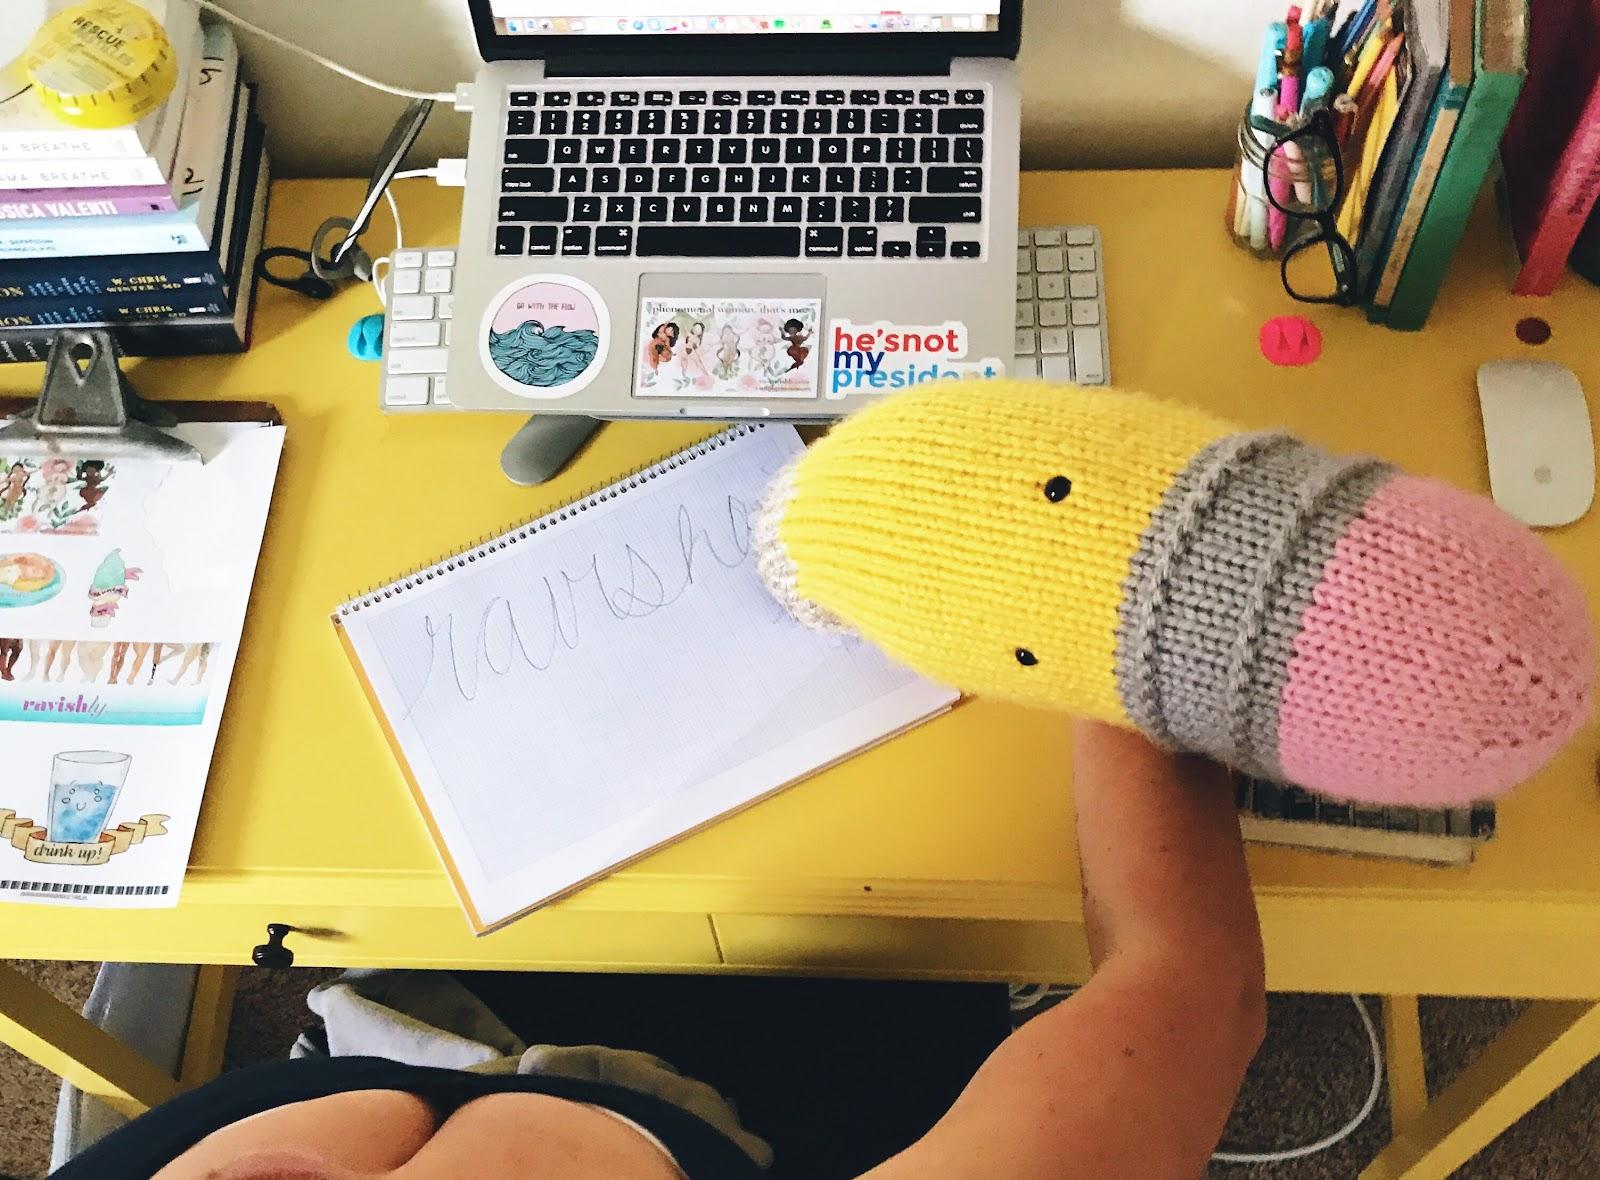 I knit that pencil.